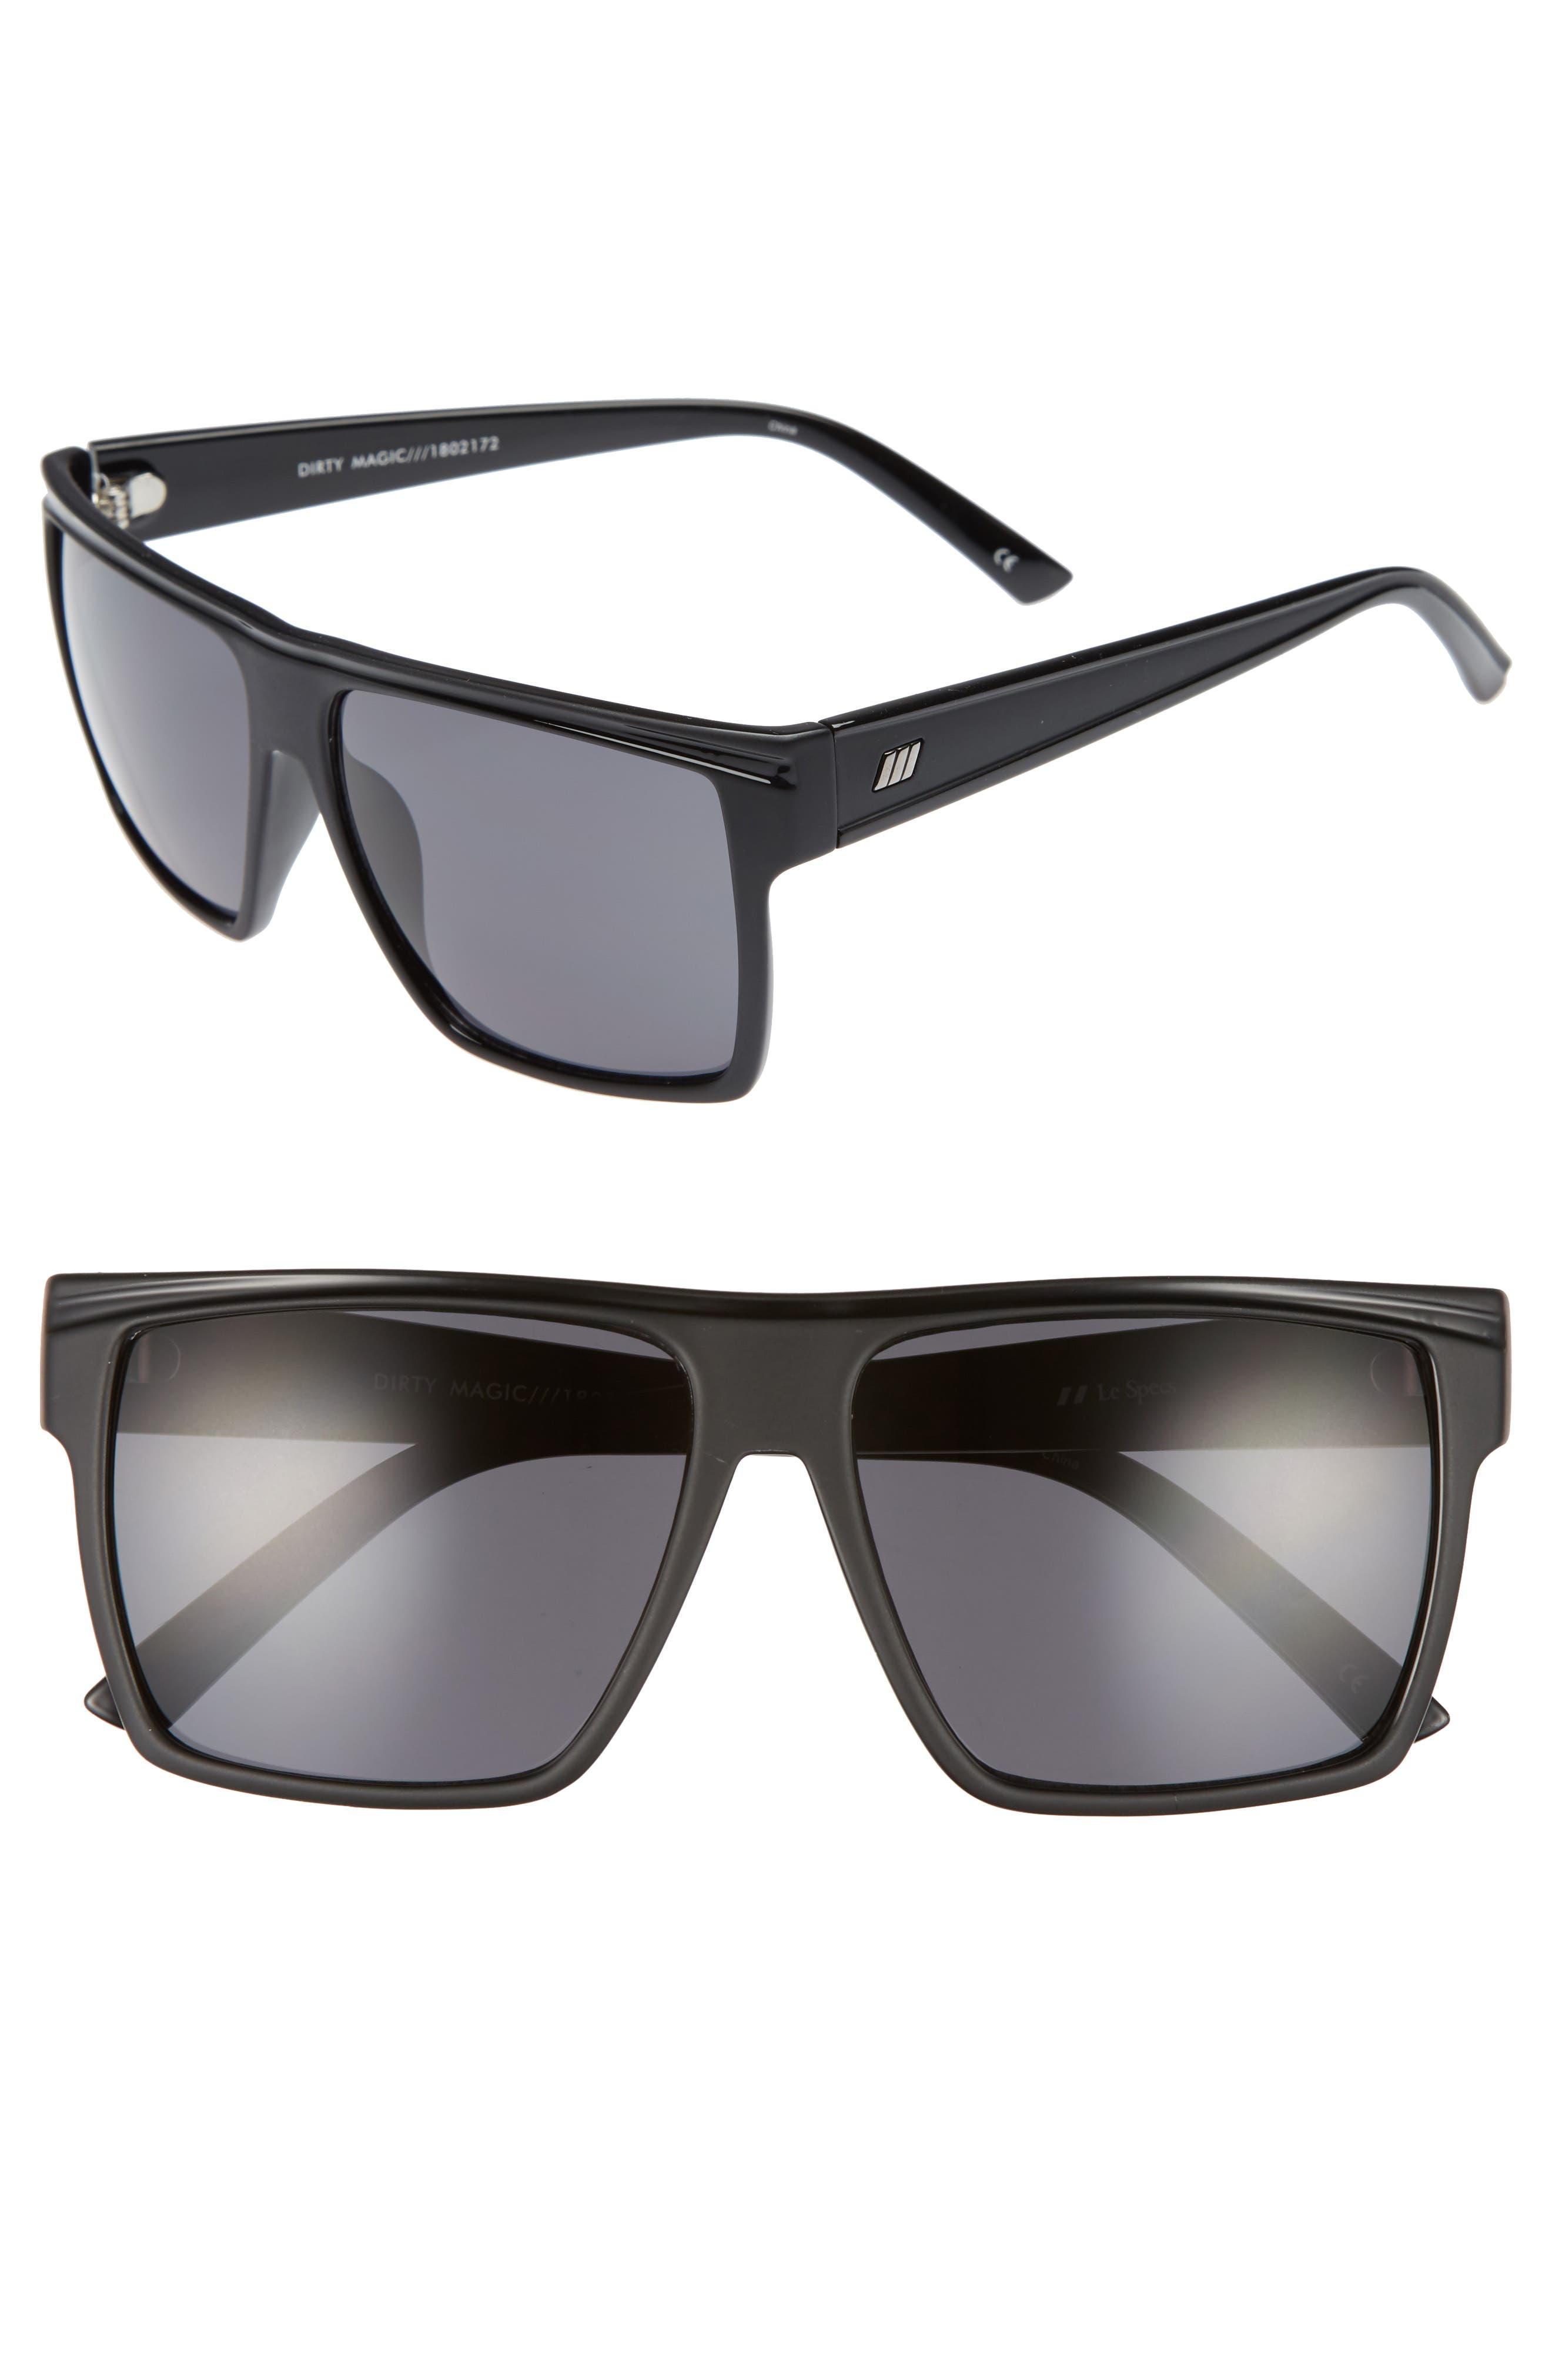 Dirty Magic 56mm Rectangle Sunglasses,                         Main,                         color, MATTE BLACK